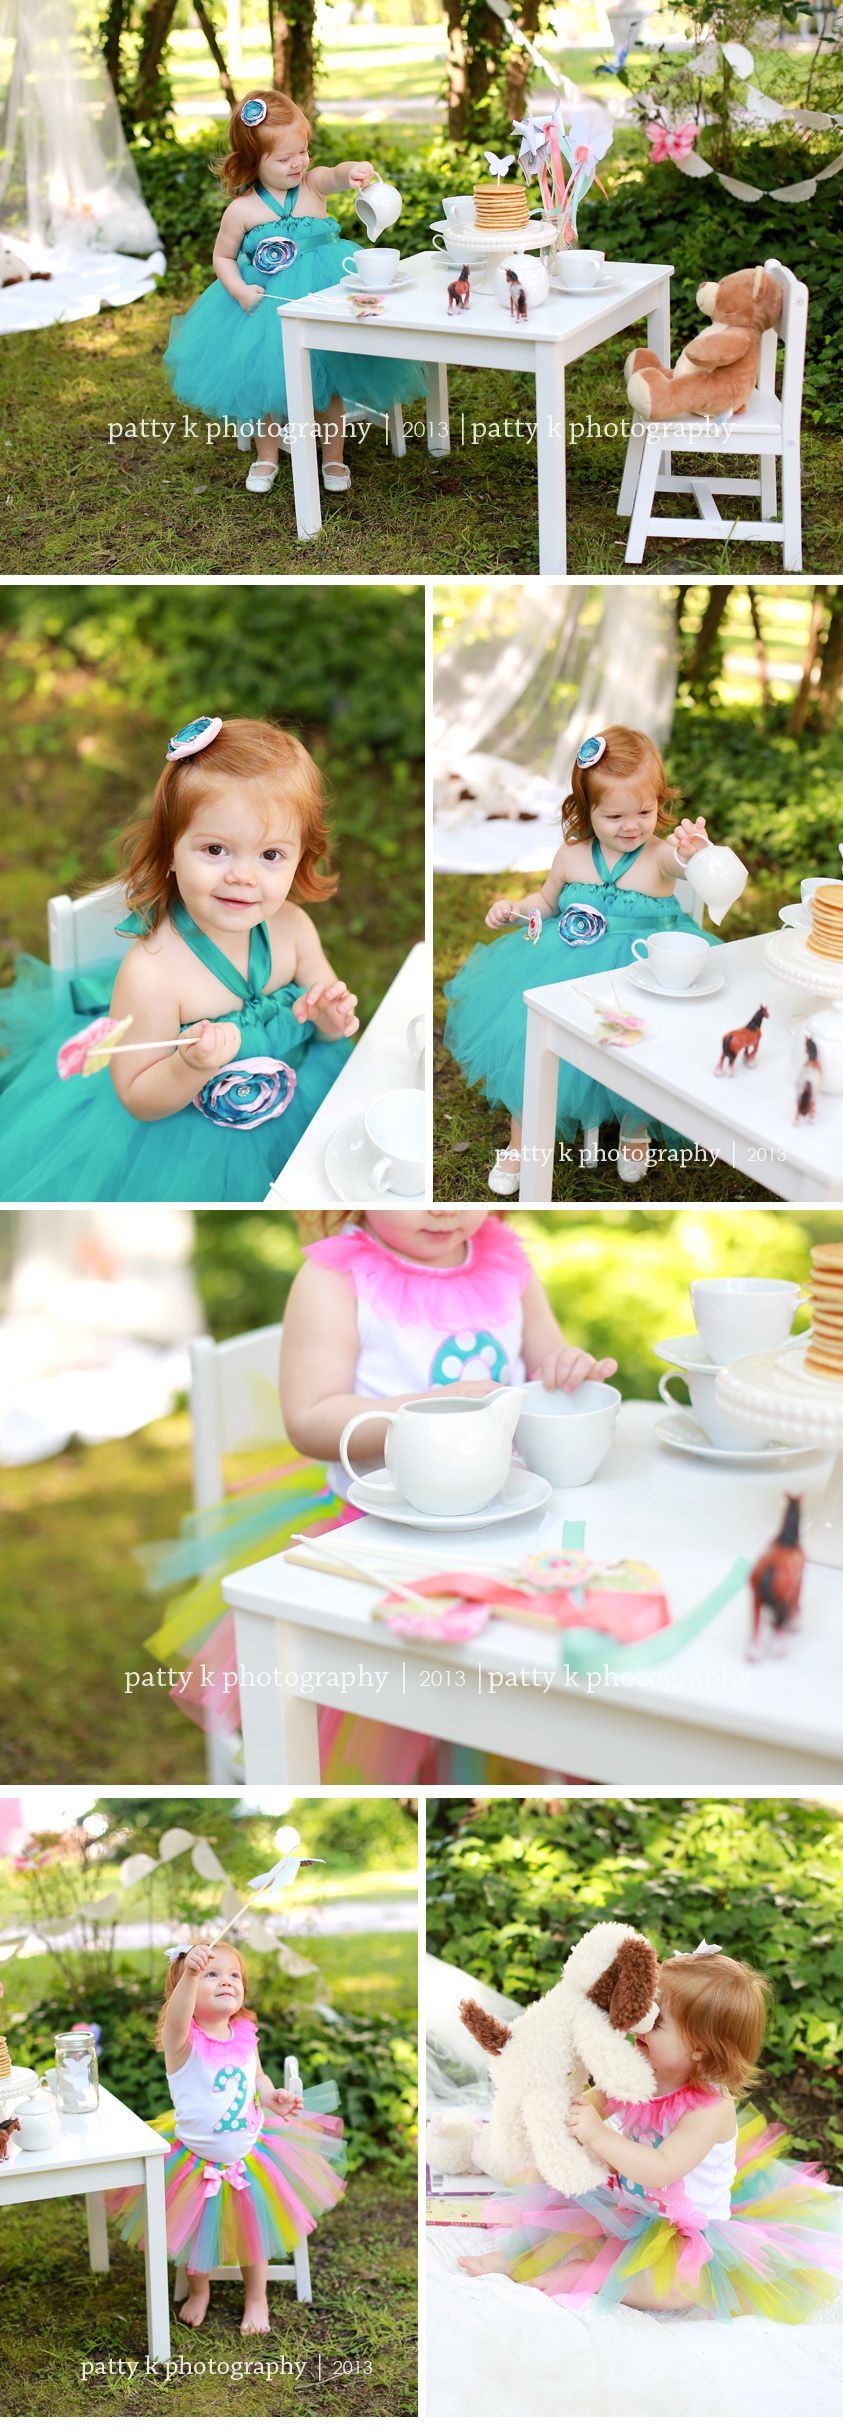 Enchanted Tea Party Minis   Imagination Session   Eveyln   Raeford, NC Child Photographer   Patty K Photography